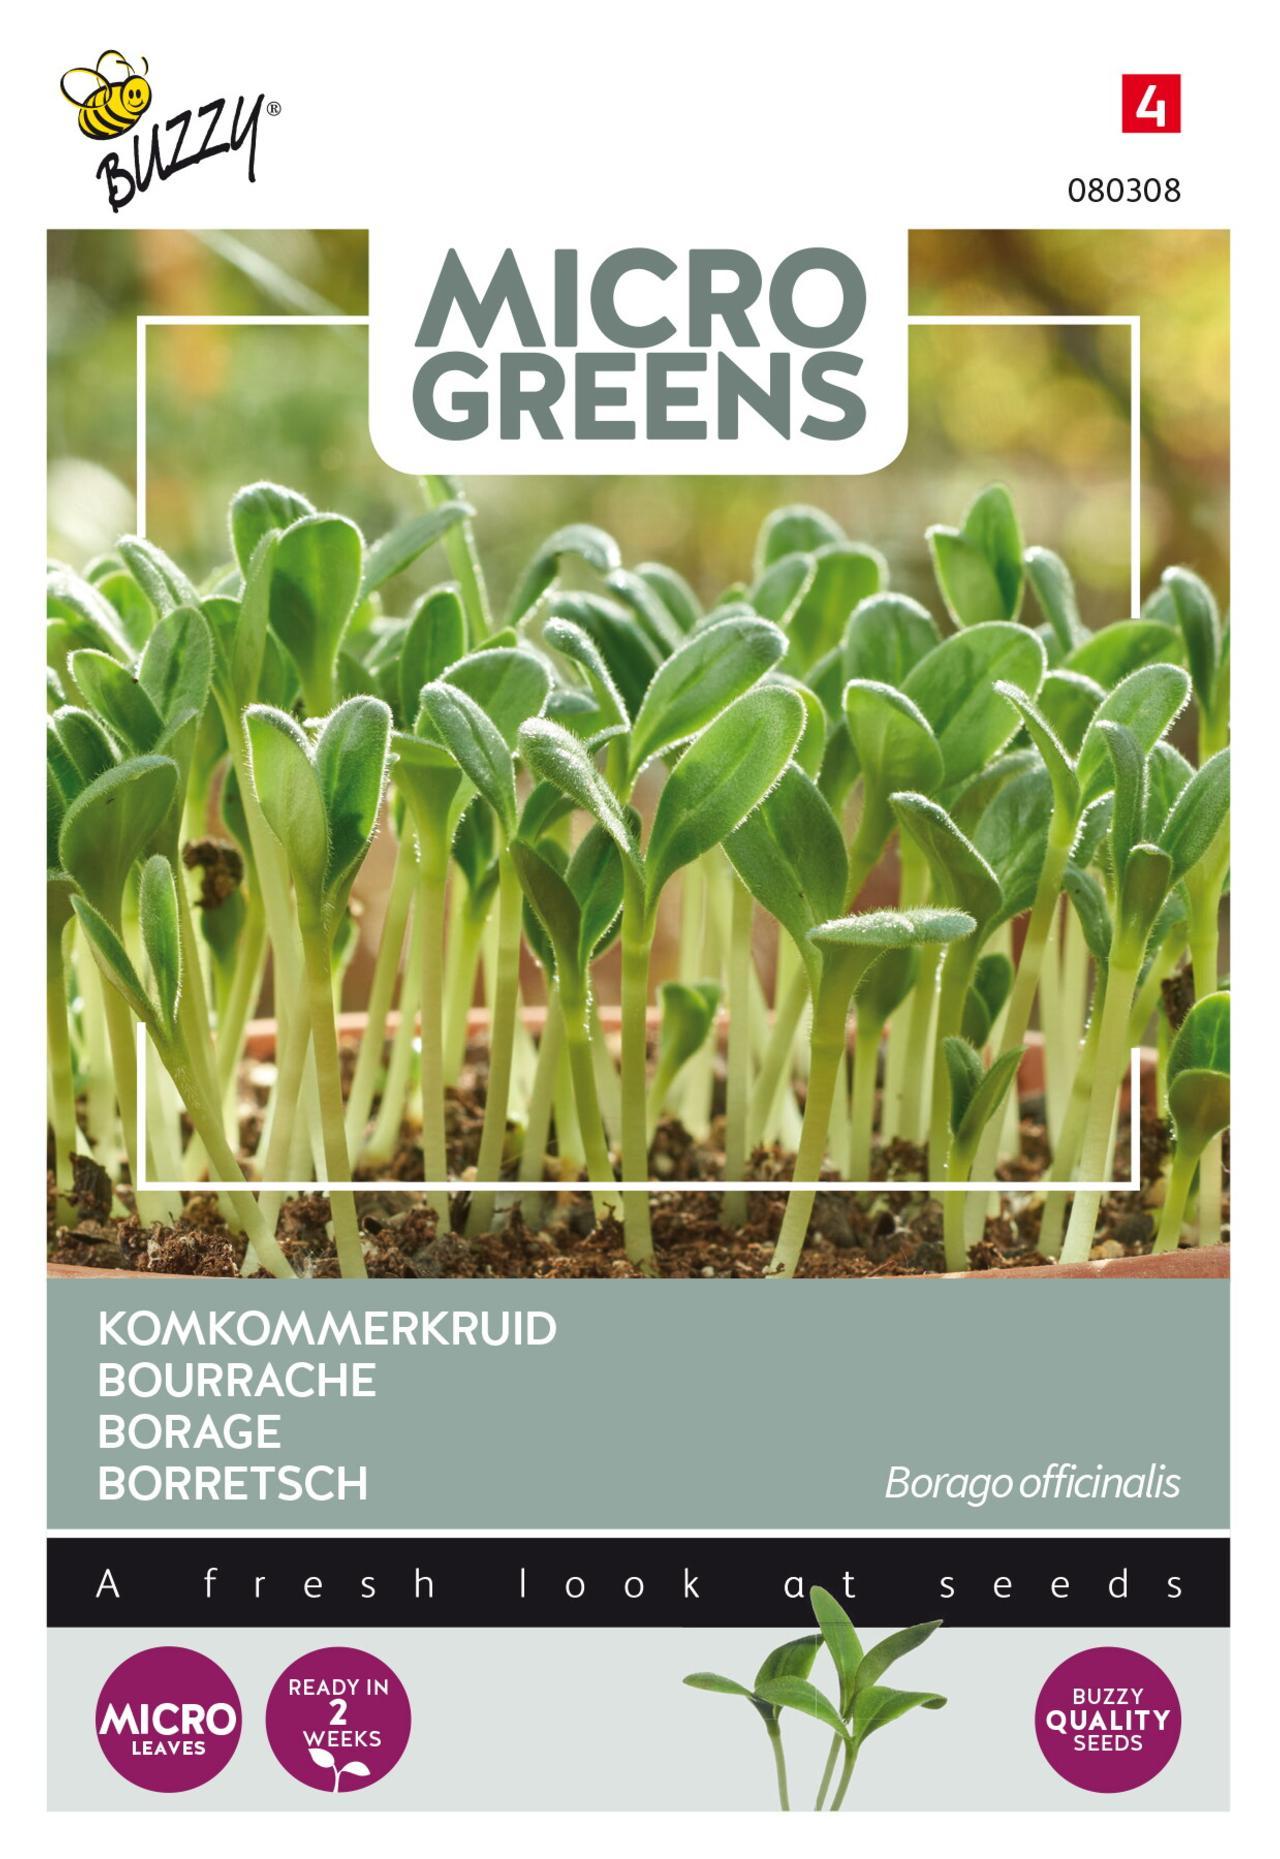 Borago officinalis (microgreens) plant